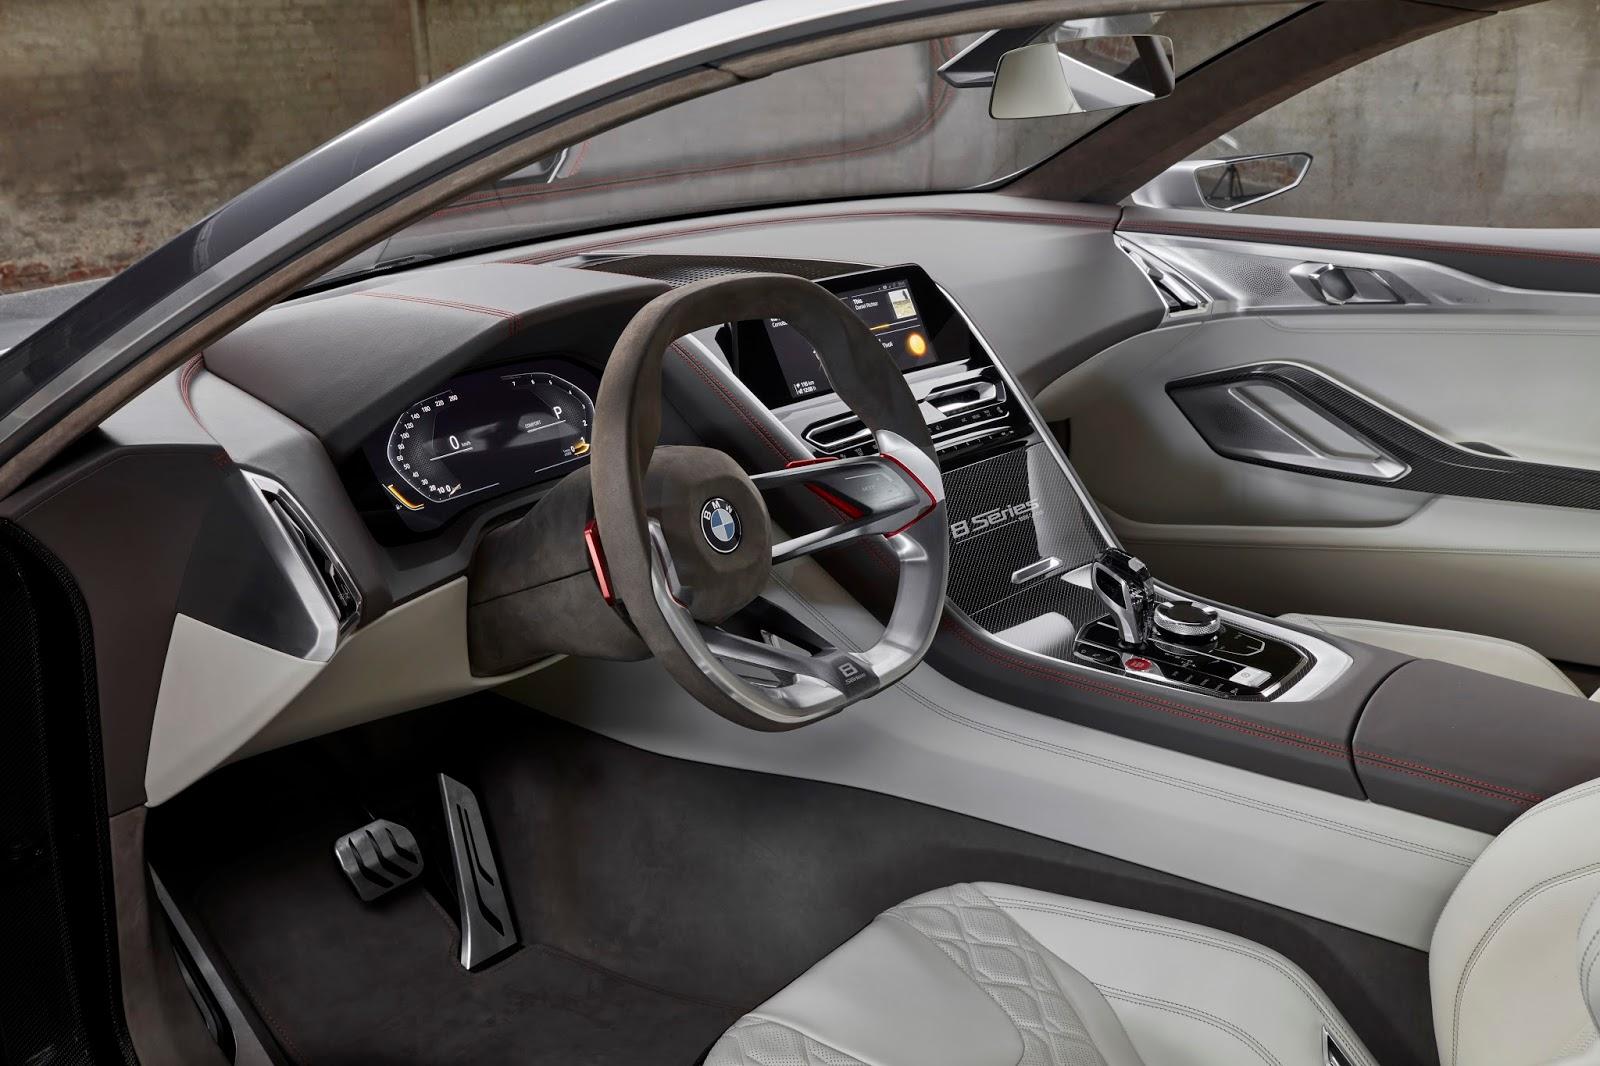 P90261129 highRes bmw concept 8 series252812529 Η BMW Σειρά 8 Coupe είναι η πεμπτουσία των μελλοντικών σπορ αυτοκινήτων BMW, BMW 8, BMW Concept, BMW Concept 8 Series, COUPE, dream car